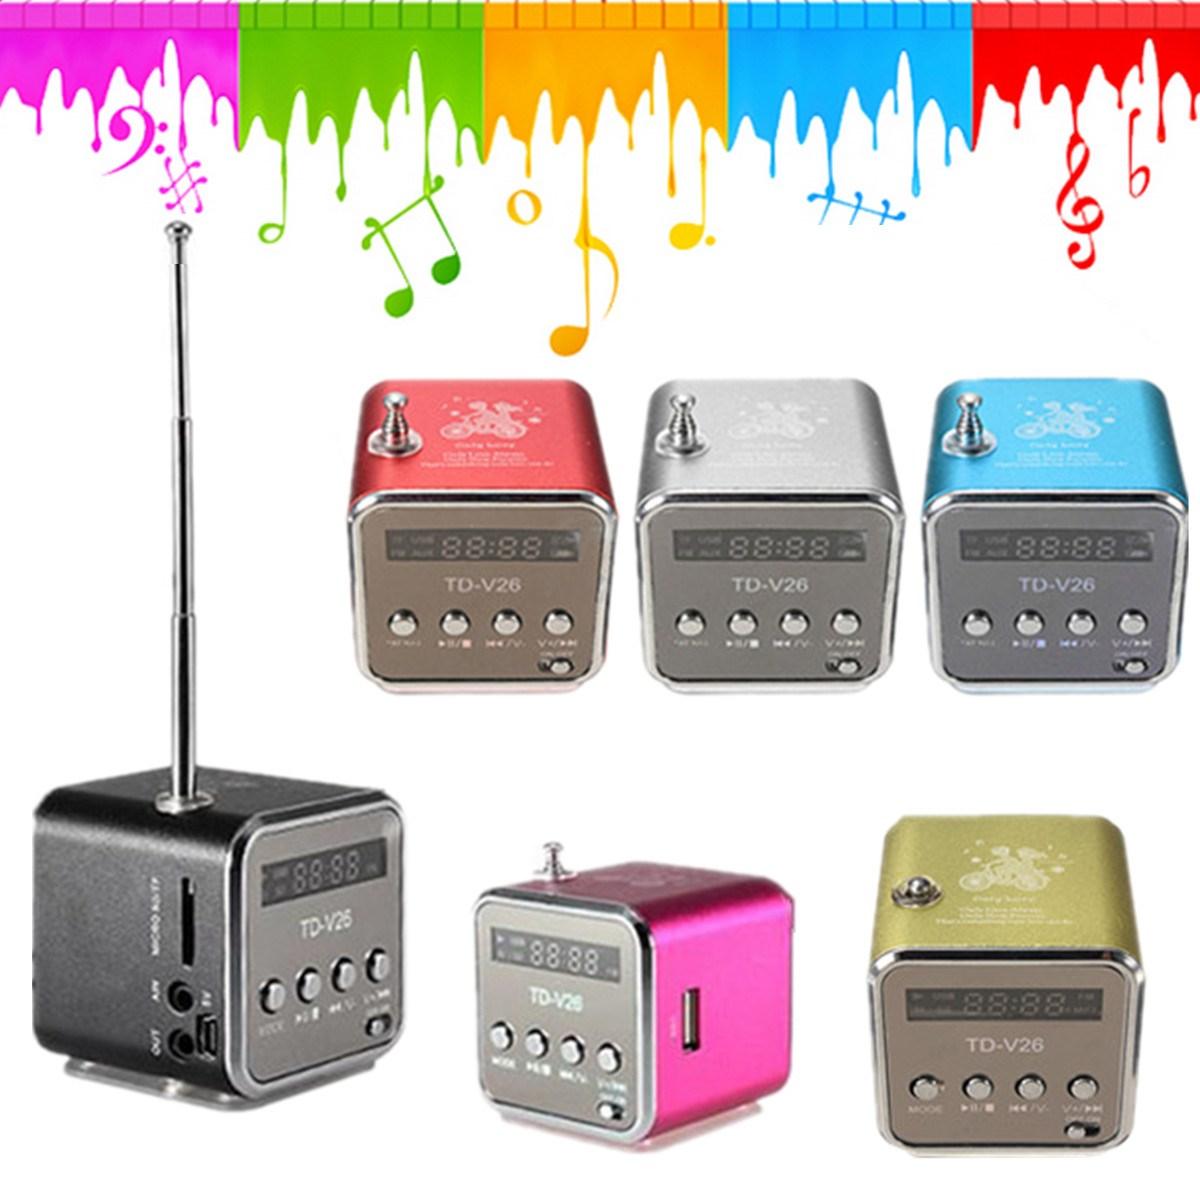 Mini Lautsprecher Radio Drahtlose Tragbare Micro USB Stereo Lautsprecher Ubwoofer Spalte Super Bass Altavoz Fm-radio-empfänger